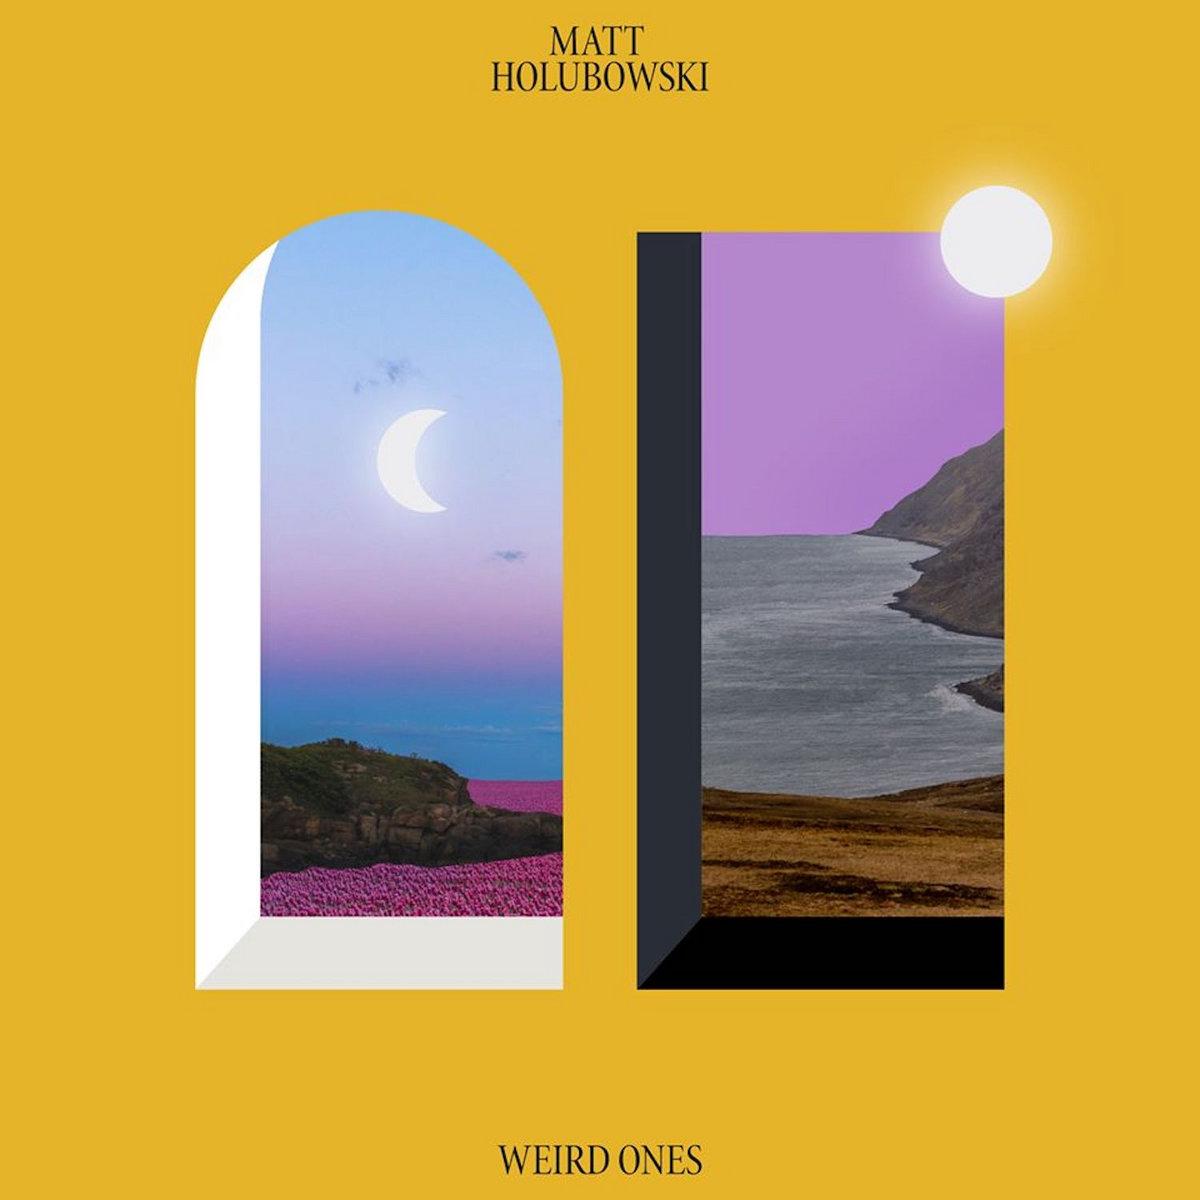 MATT HOLUBOWSKI : nouvel album Weird Ones disponible maintenant